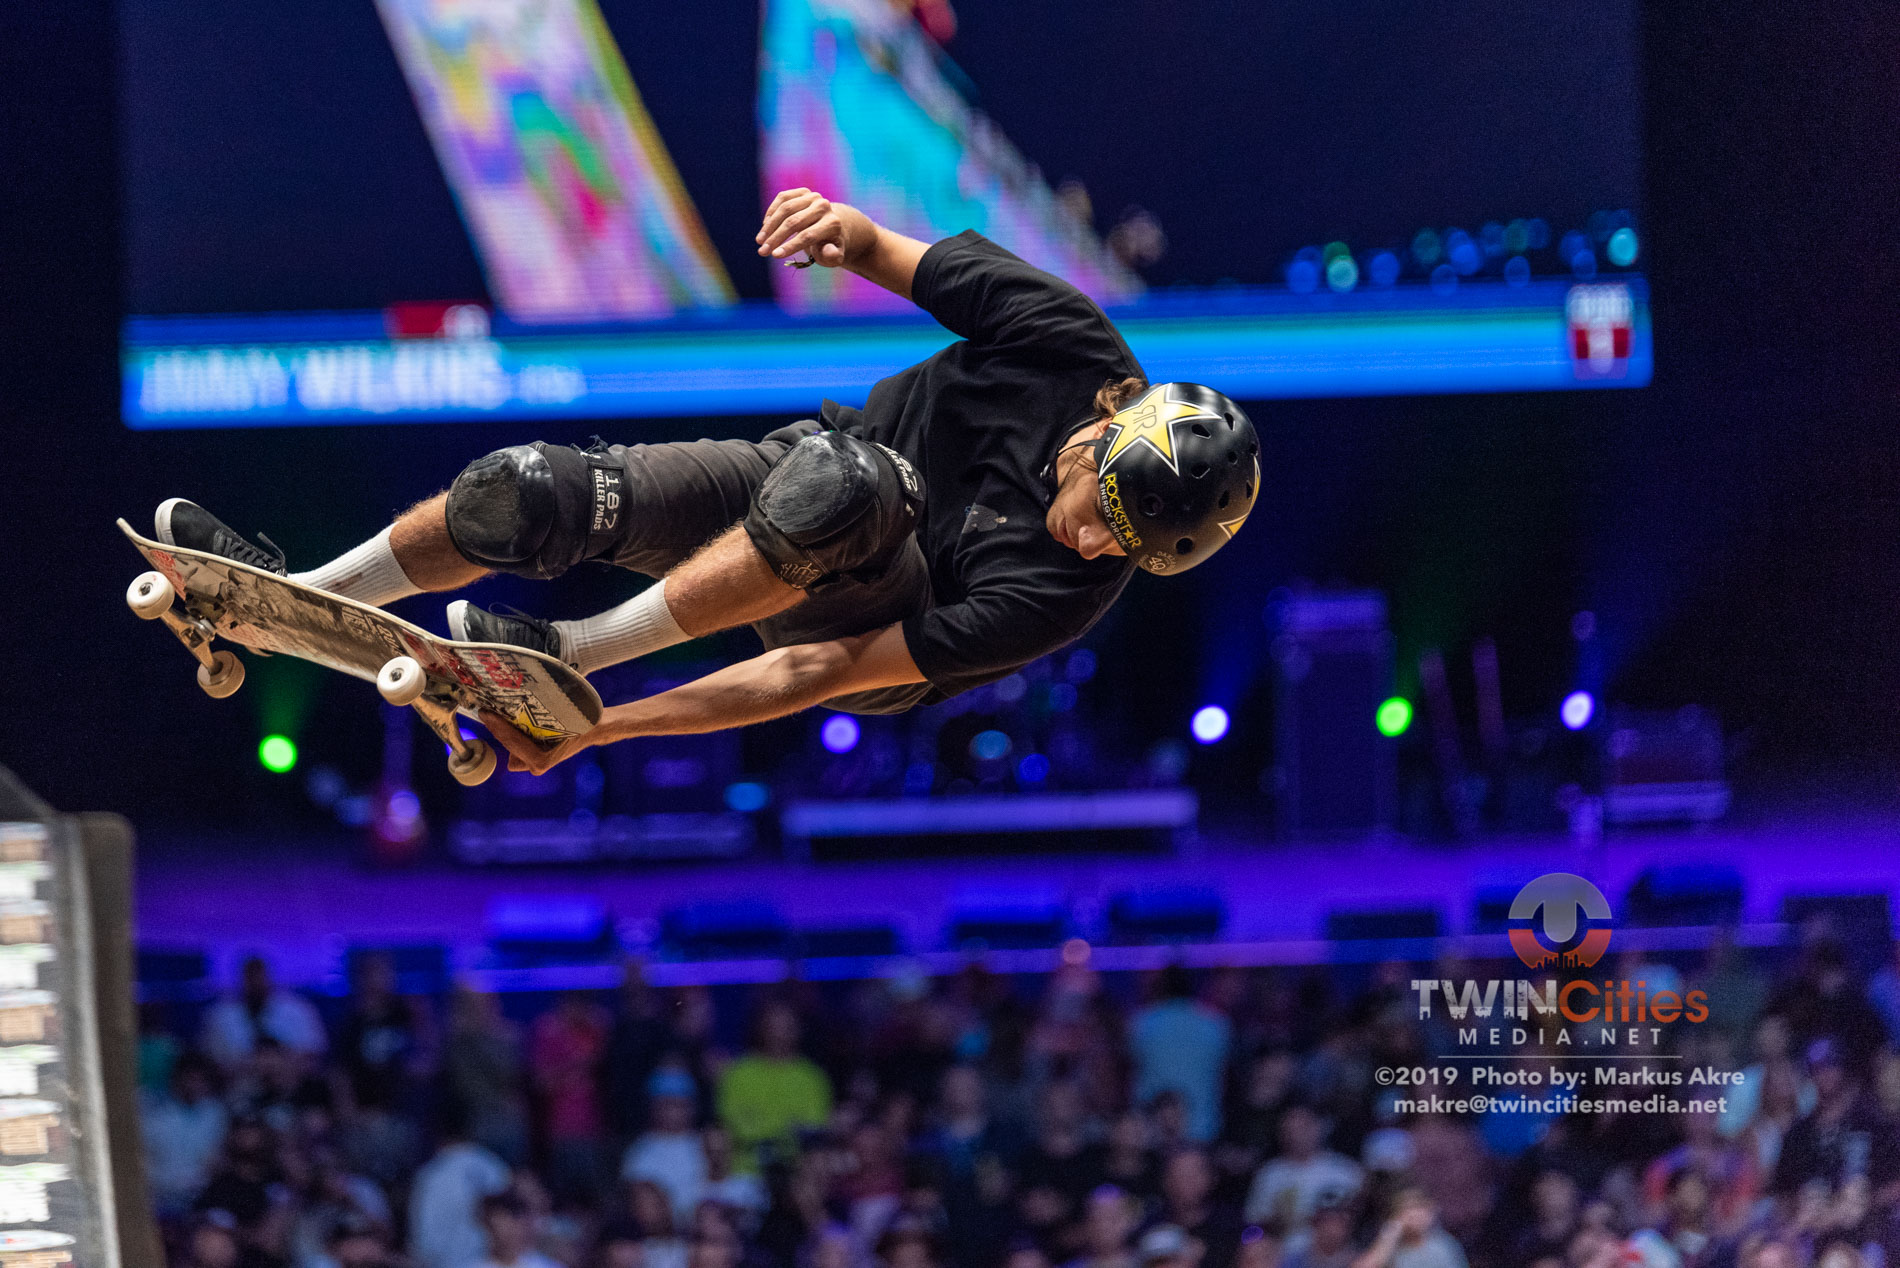 2019-X-Games-Day-1-Skateboard-Vert-17